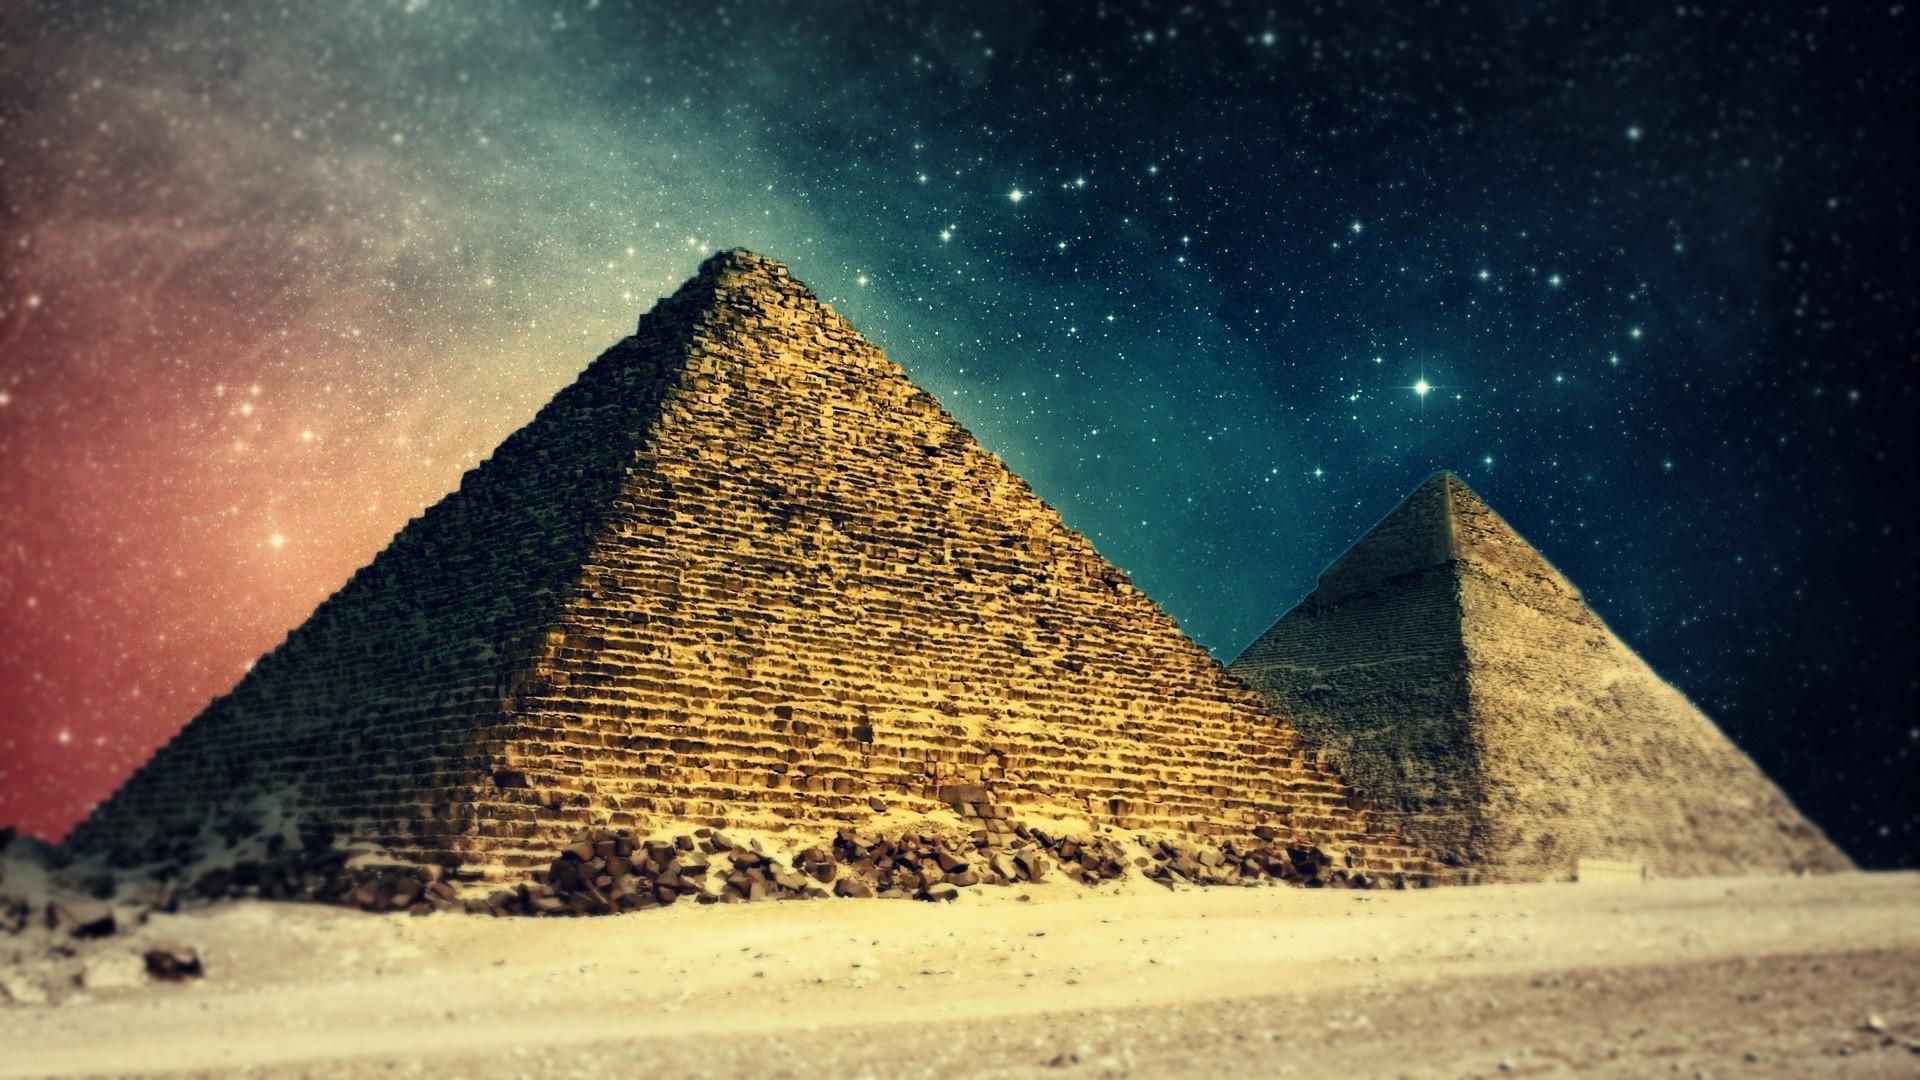 пирамида на фотообоях фото переживания затягивают нас